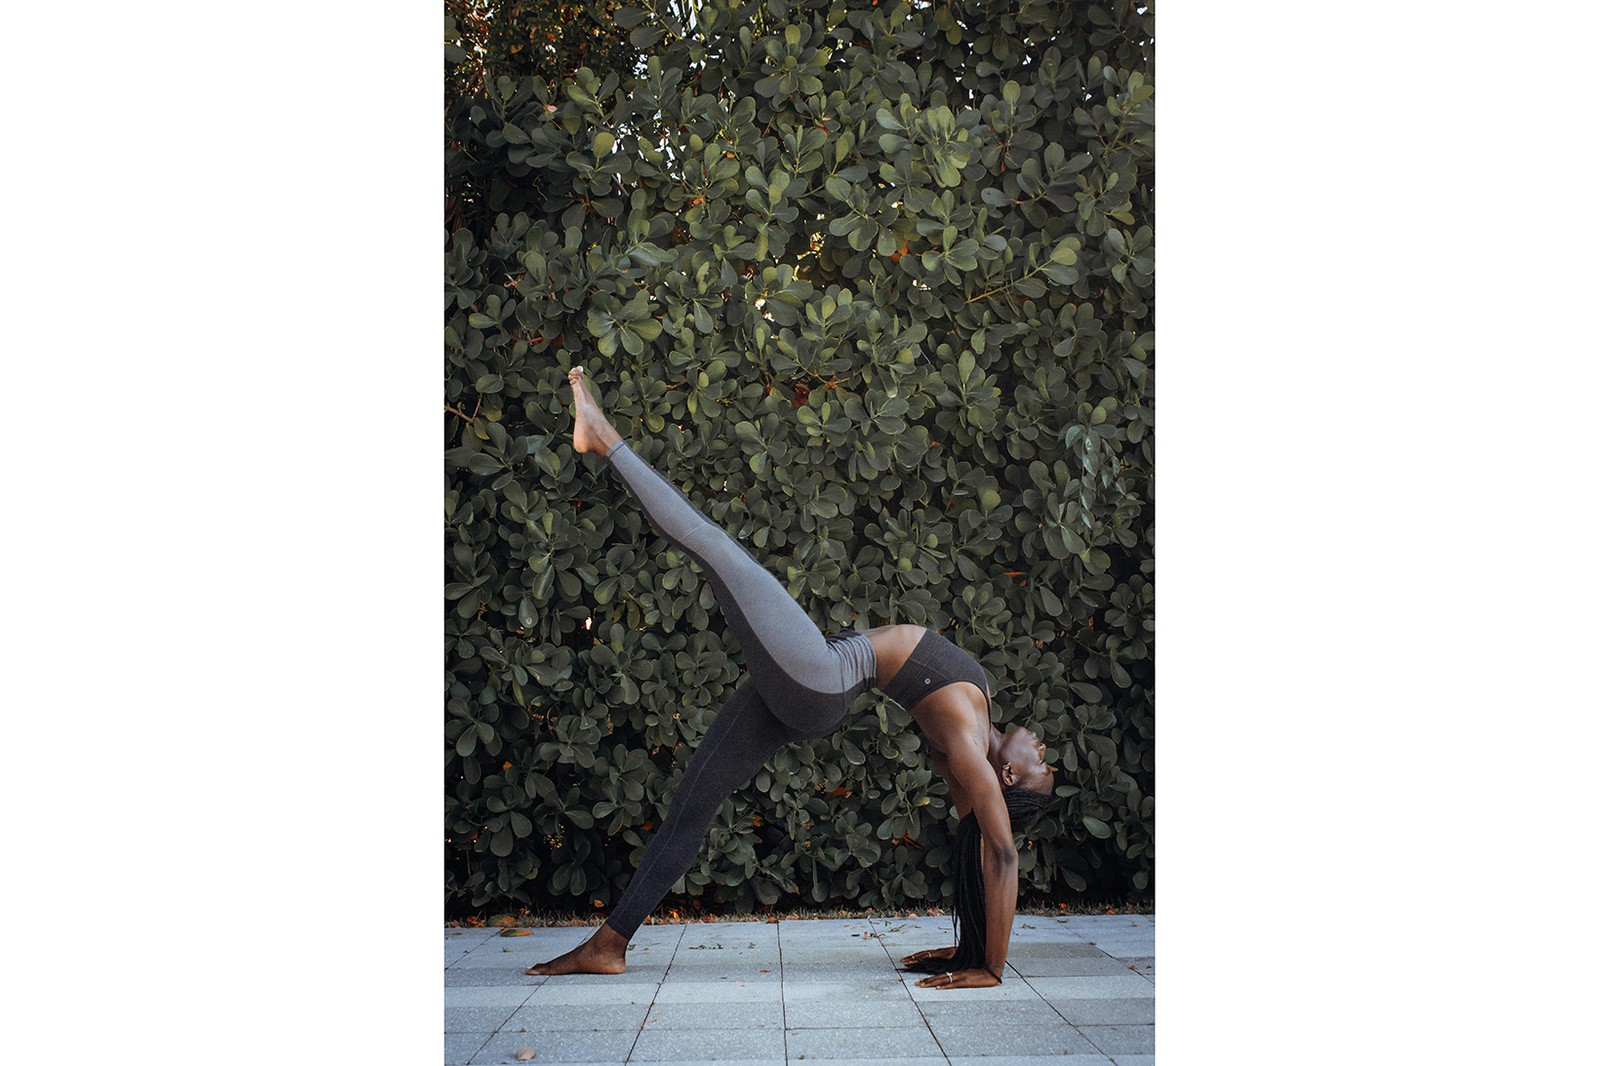 Yoga Pose Mia The Healthlete NYC Leggings Sports Bra